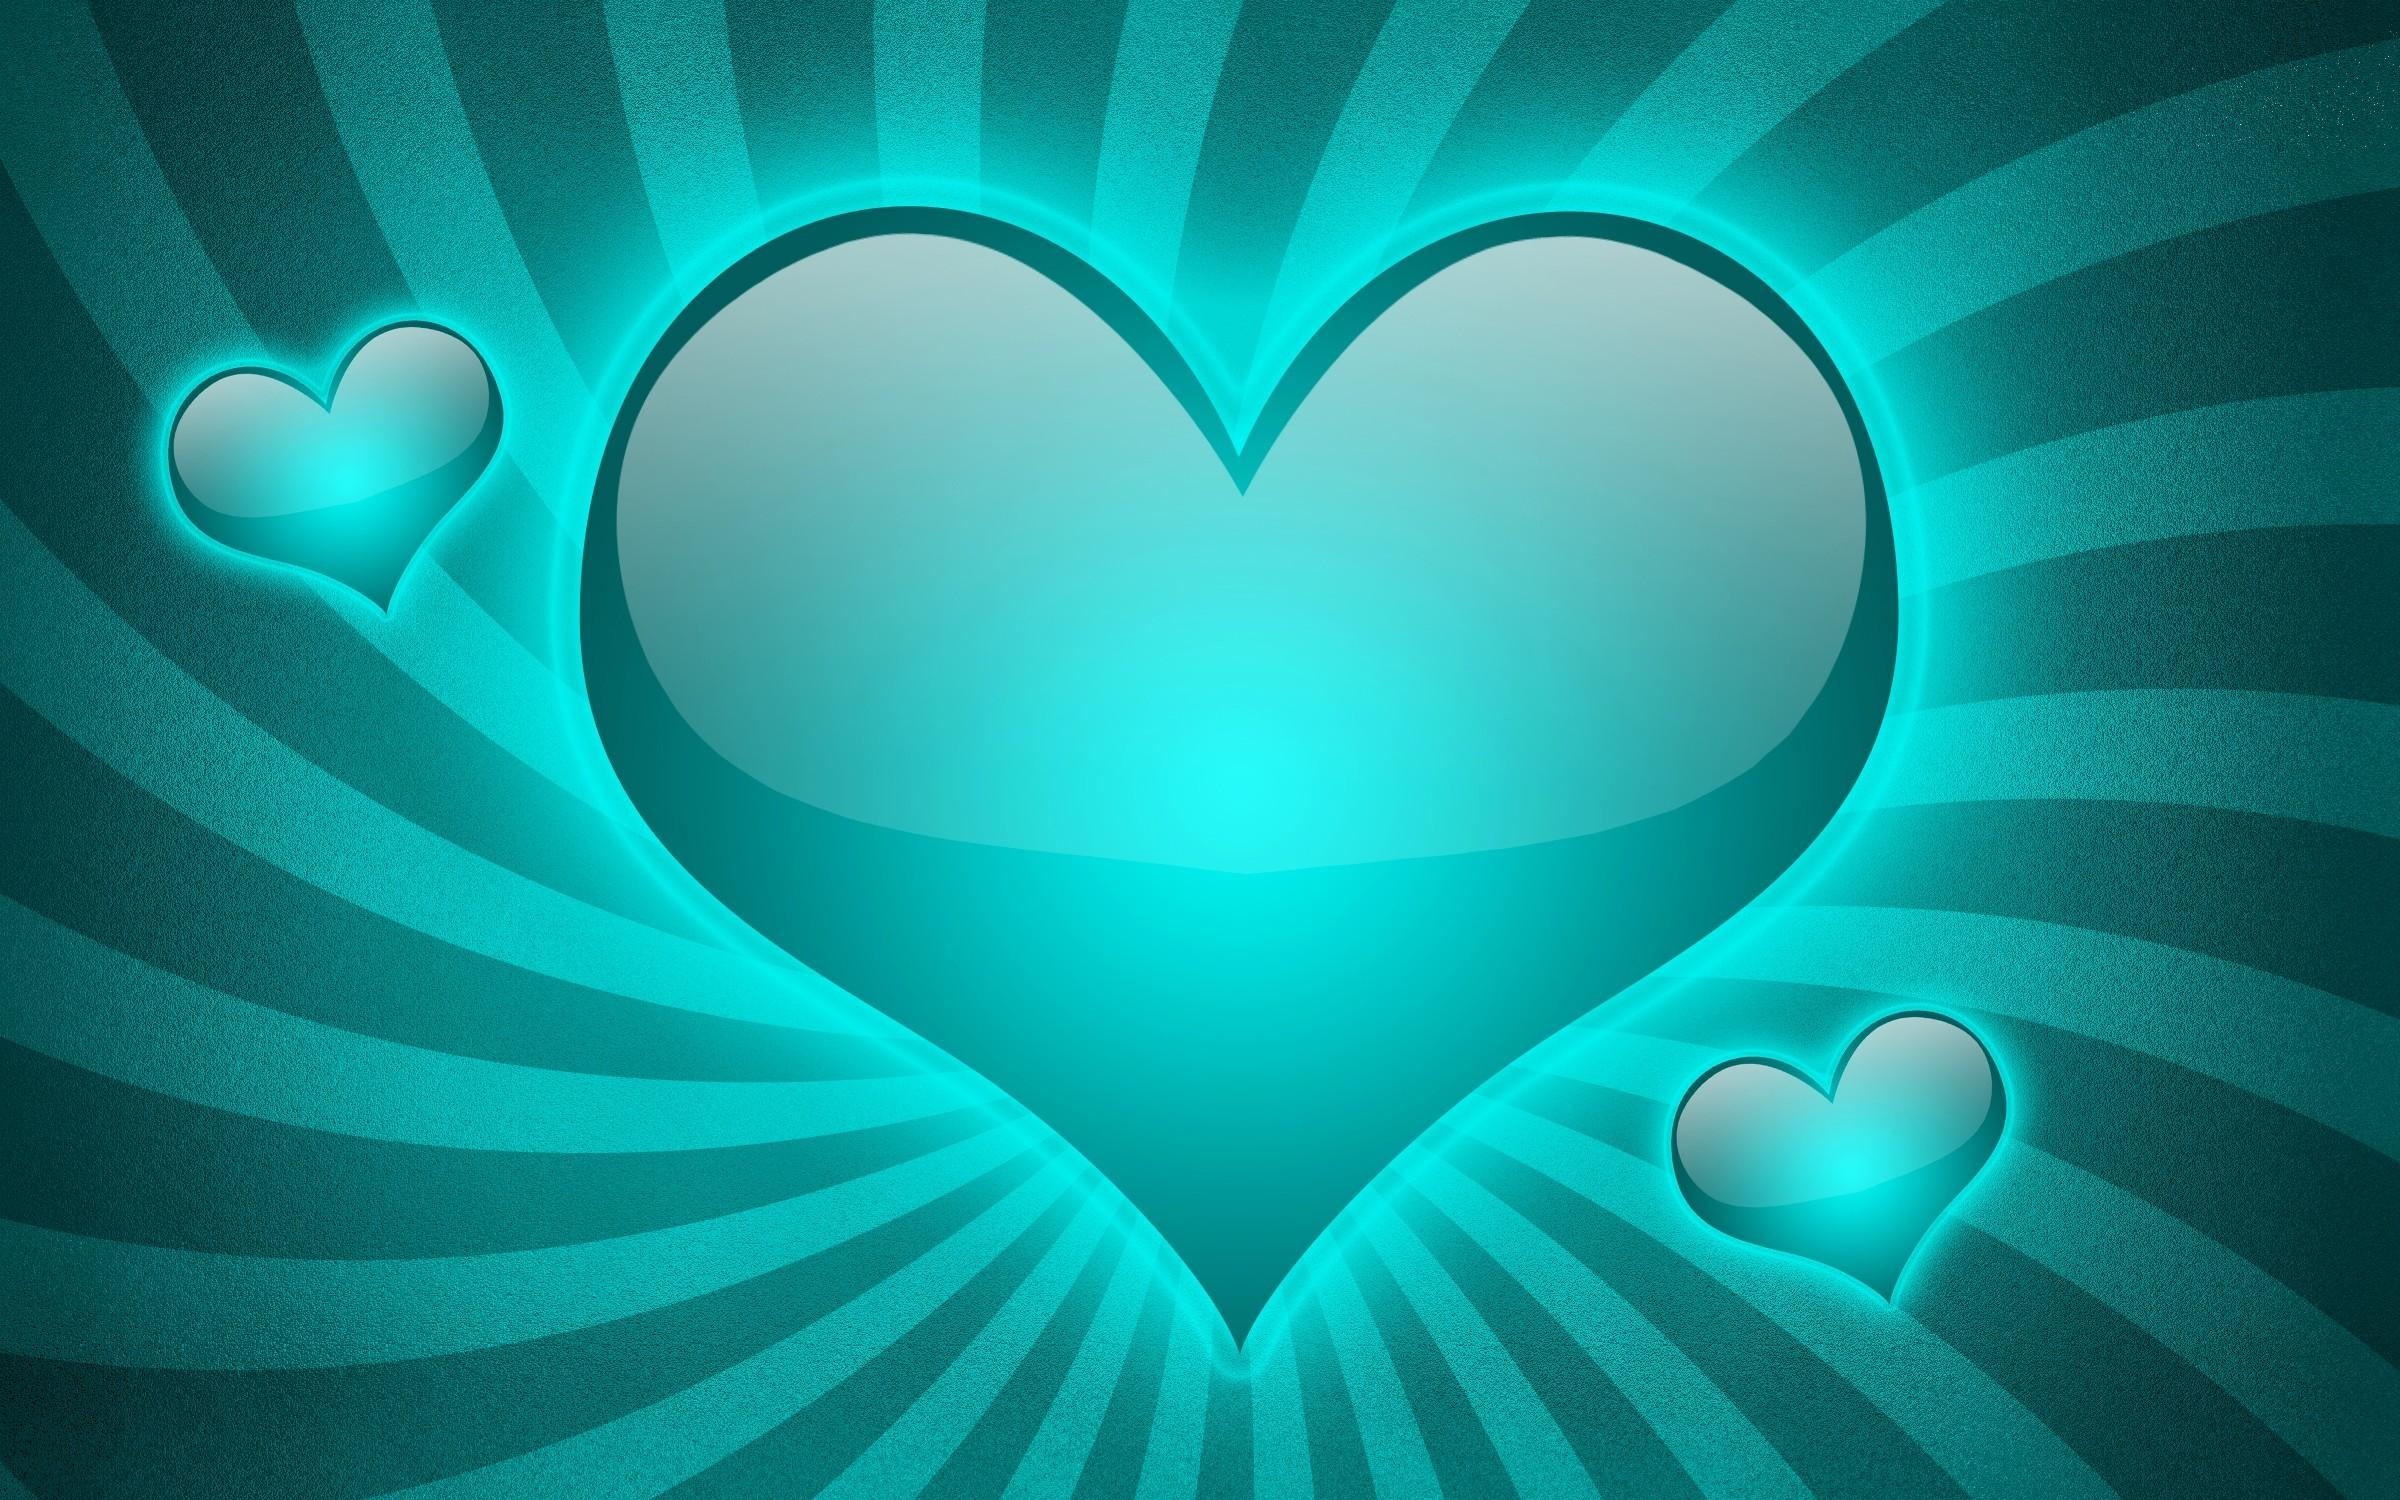 Wallpaper hearts, lines, stripes, blue